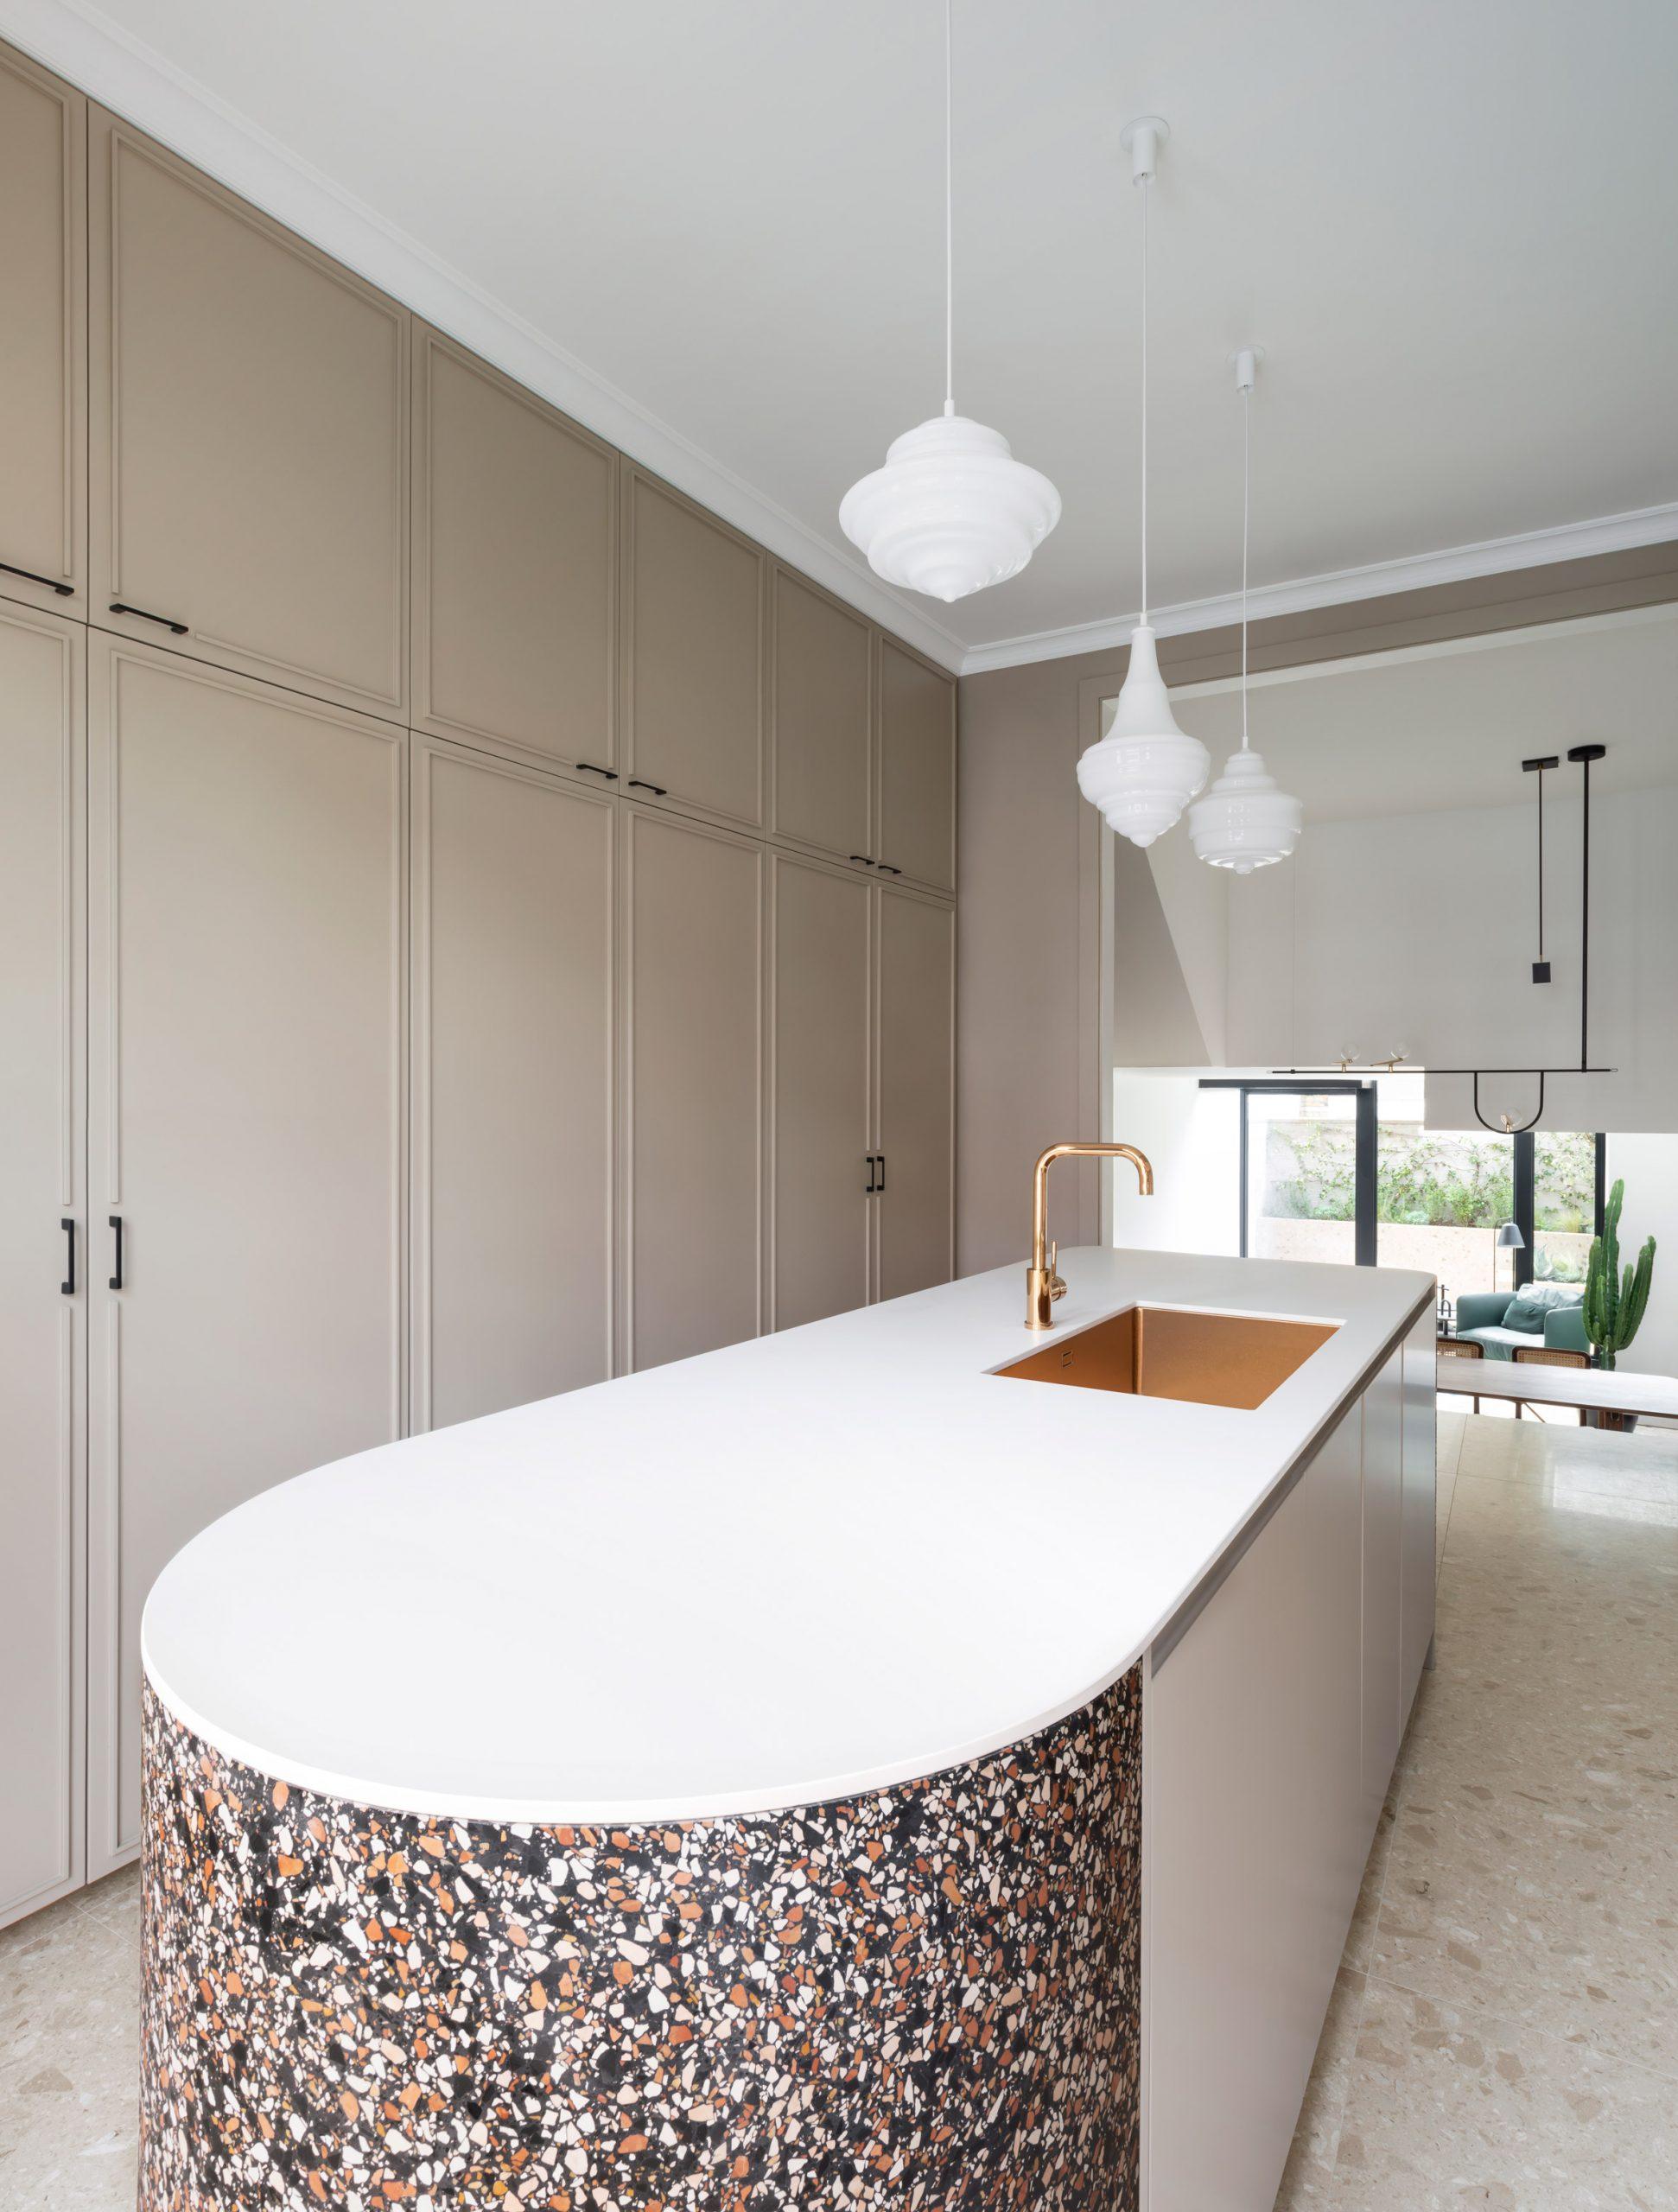 Terrazzo kitchen at Frame House by Bureau de Change